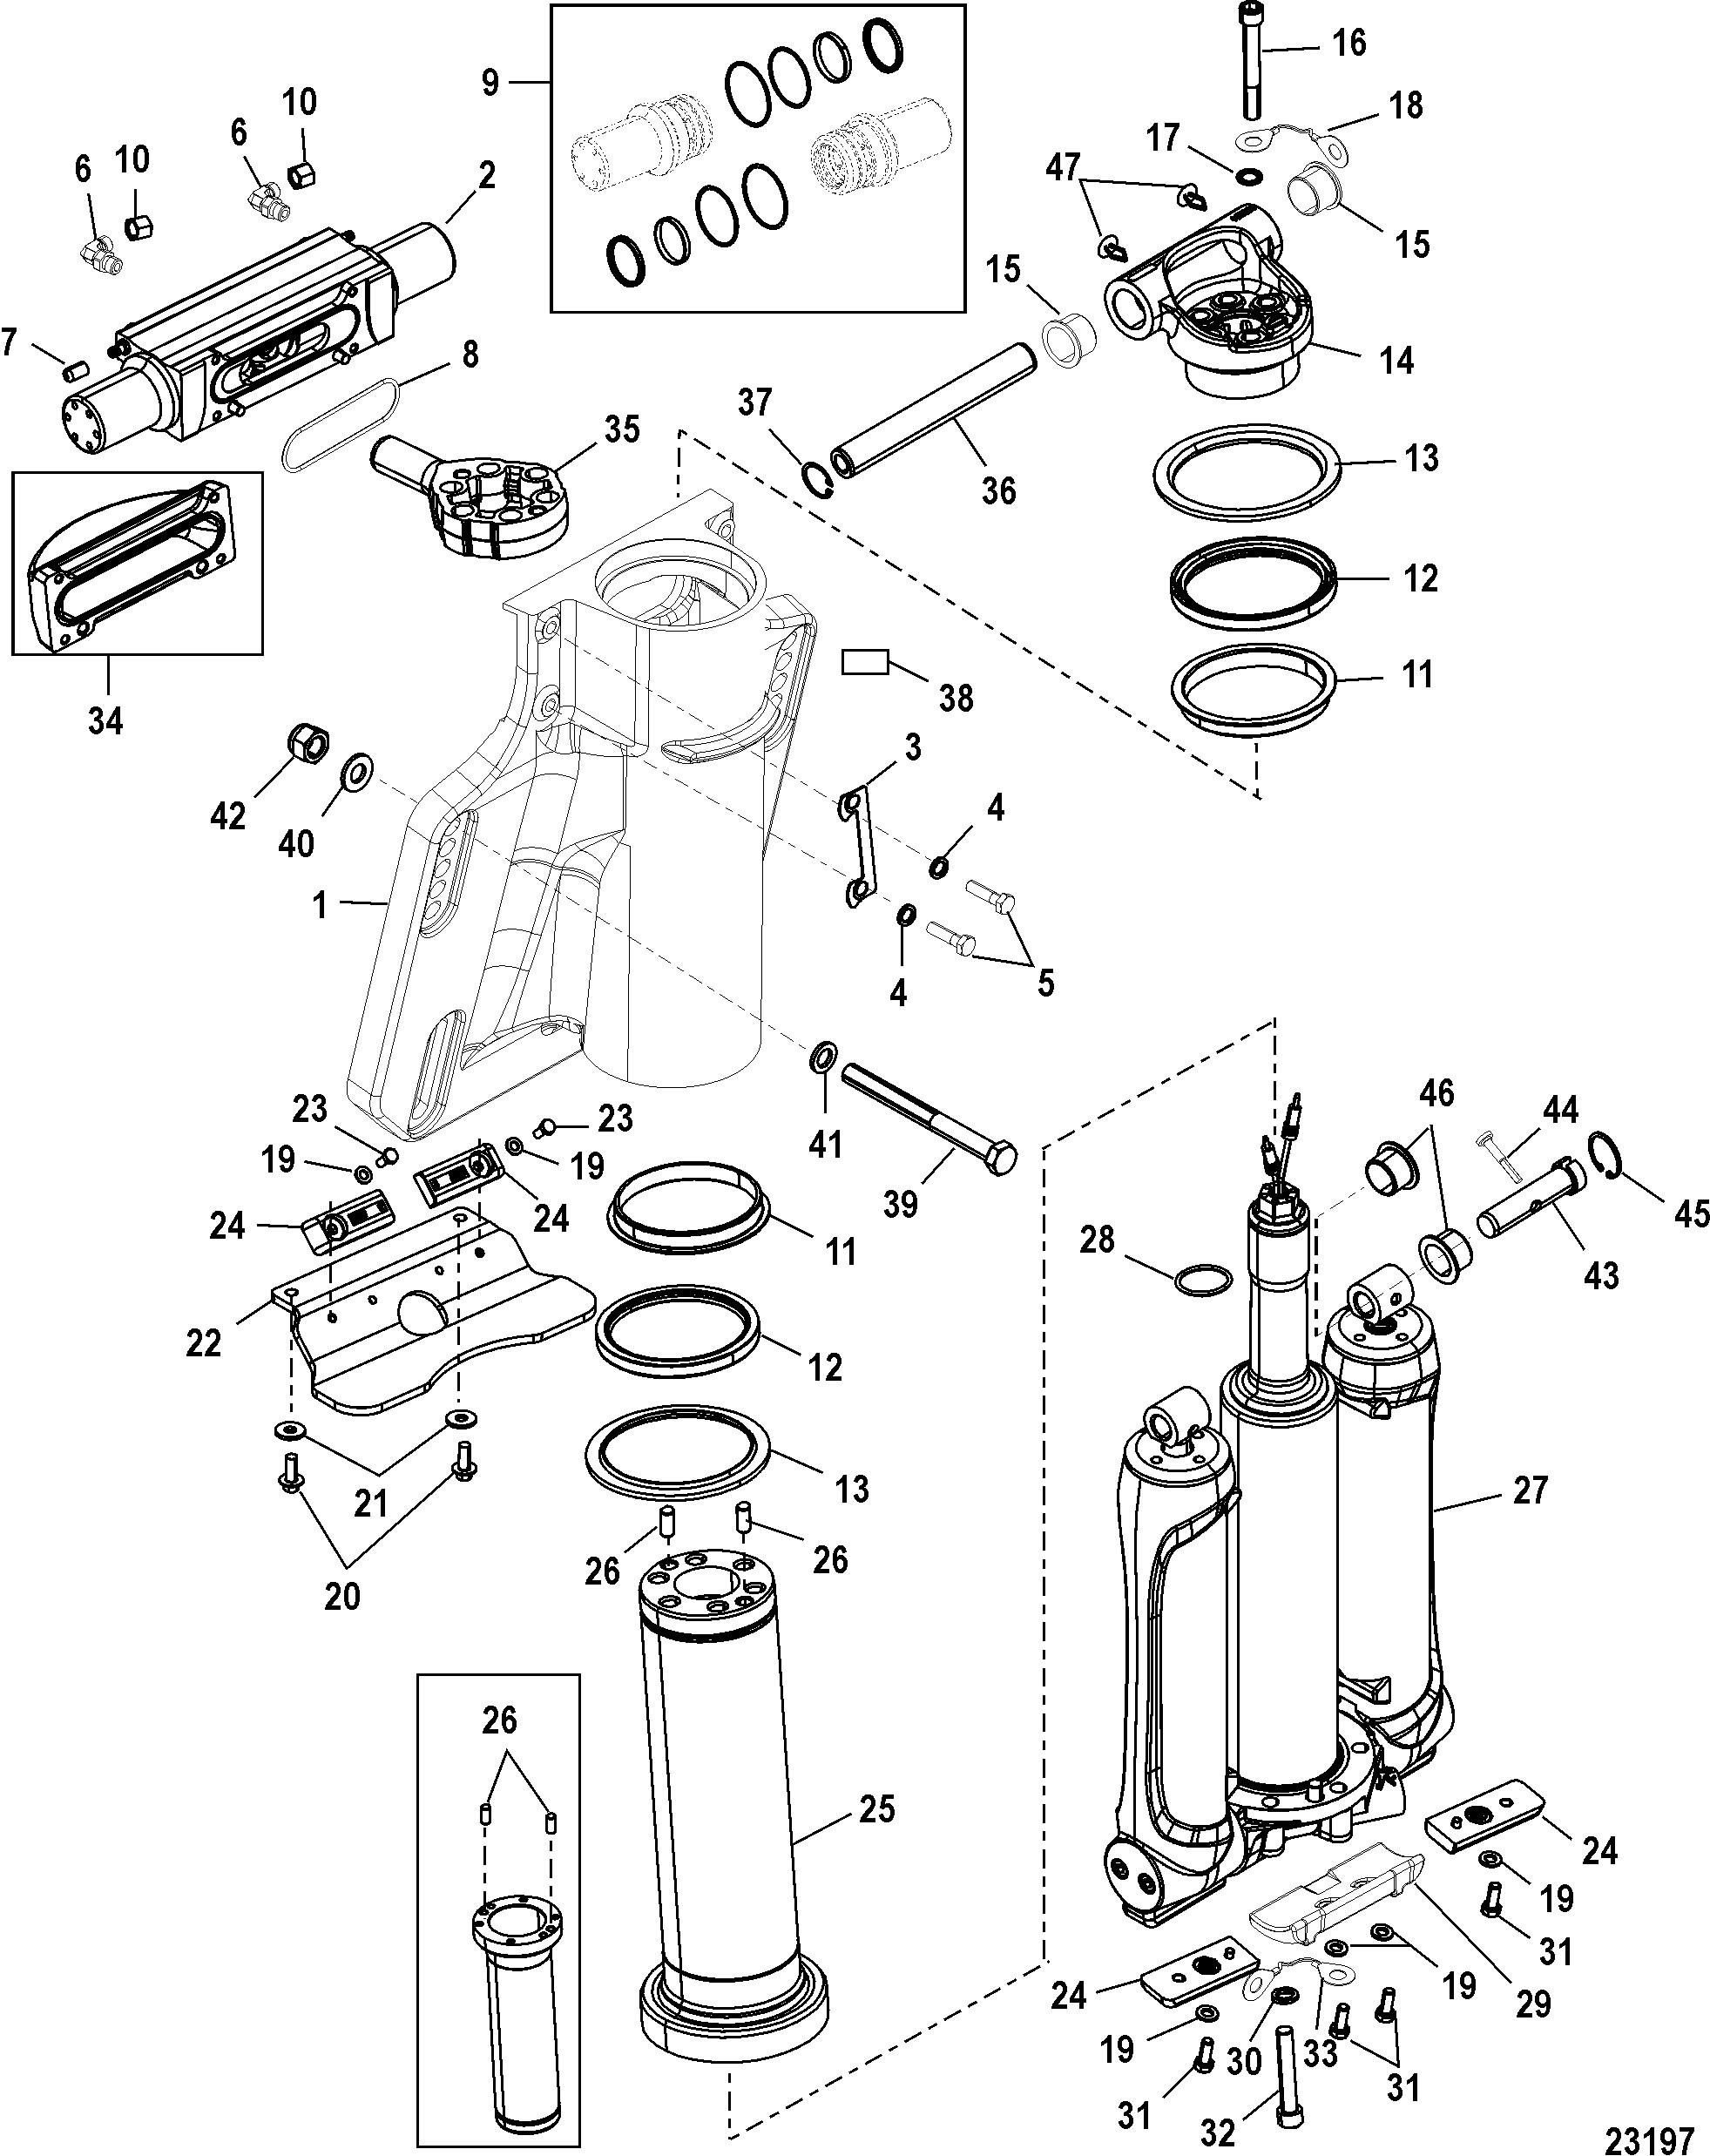 4 Stroke Diesel Engine Diagram Verado Engine Diagram Daily Update Wiring Diagram Of 4 Stroke Diesel Engine Diagram